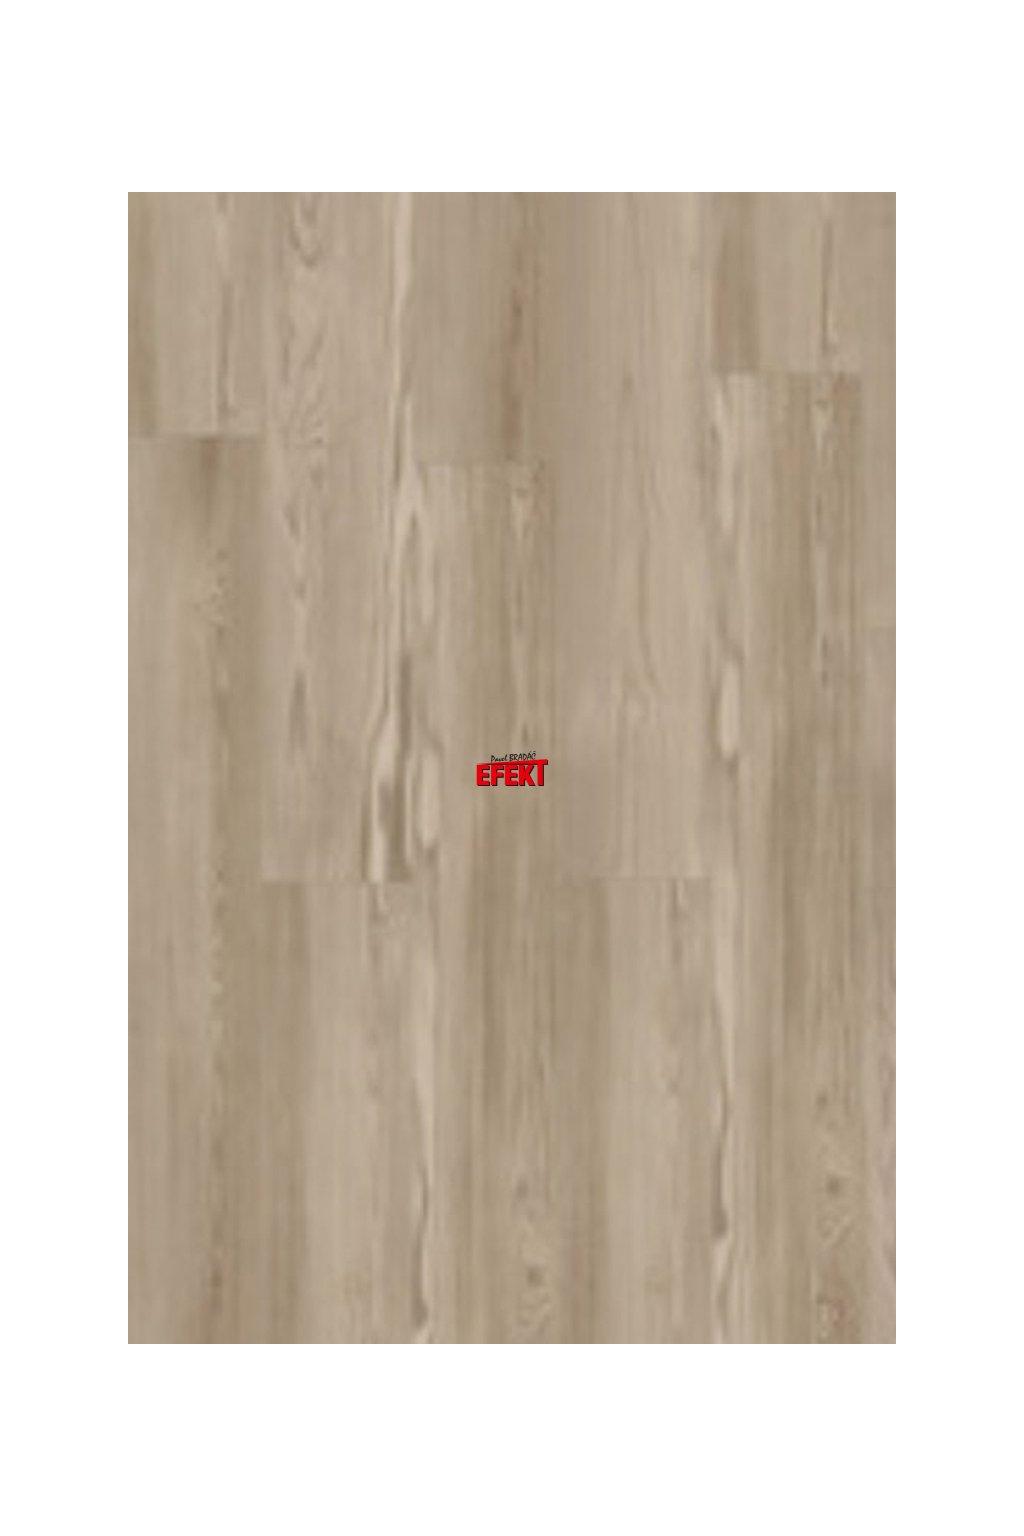 Gerflor Lepený 30 North Wood Mokaccino